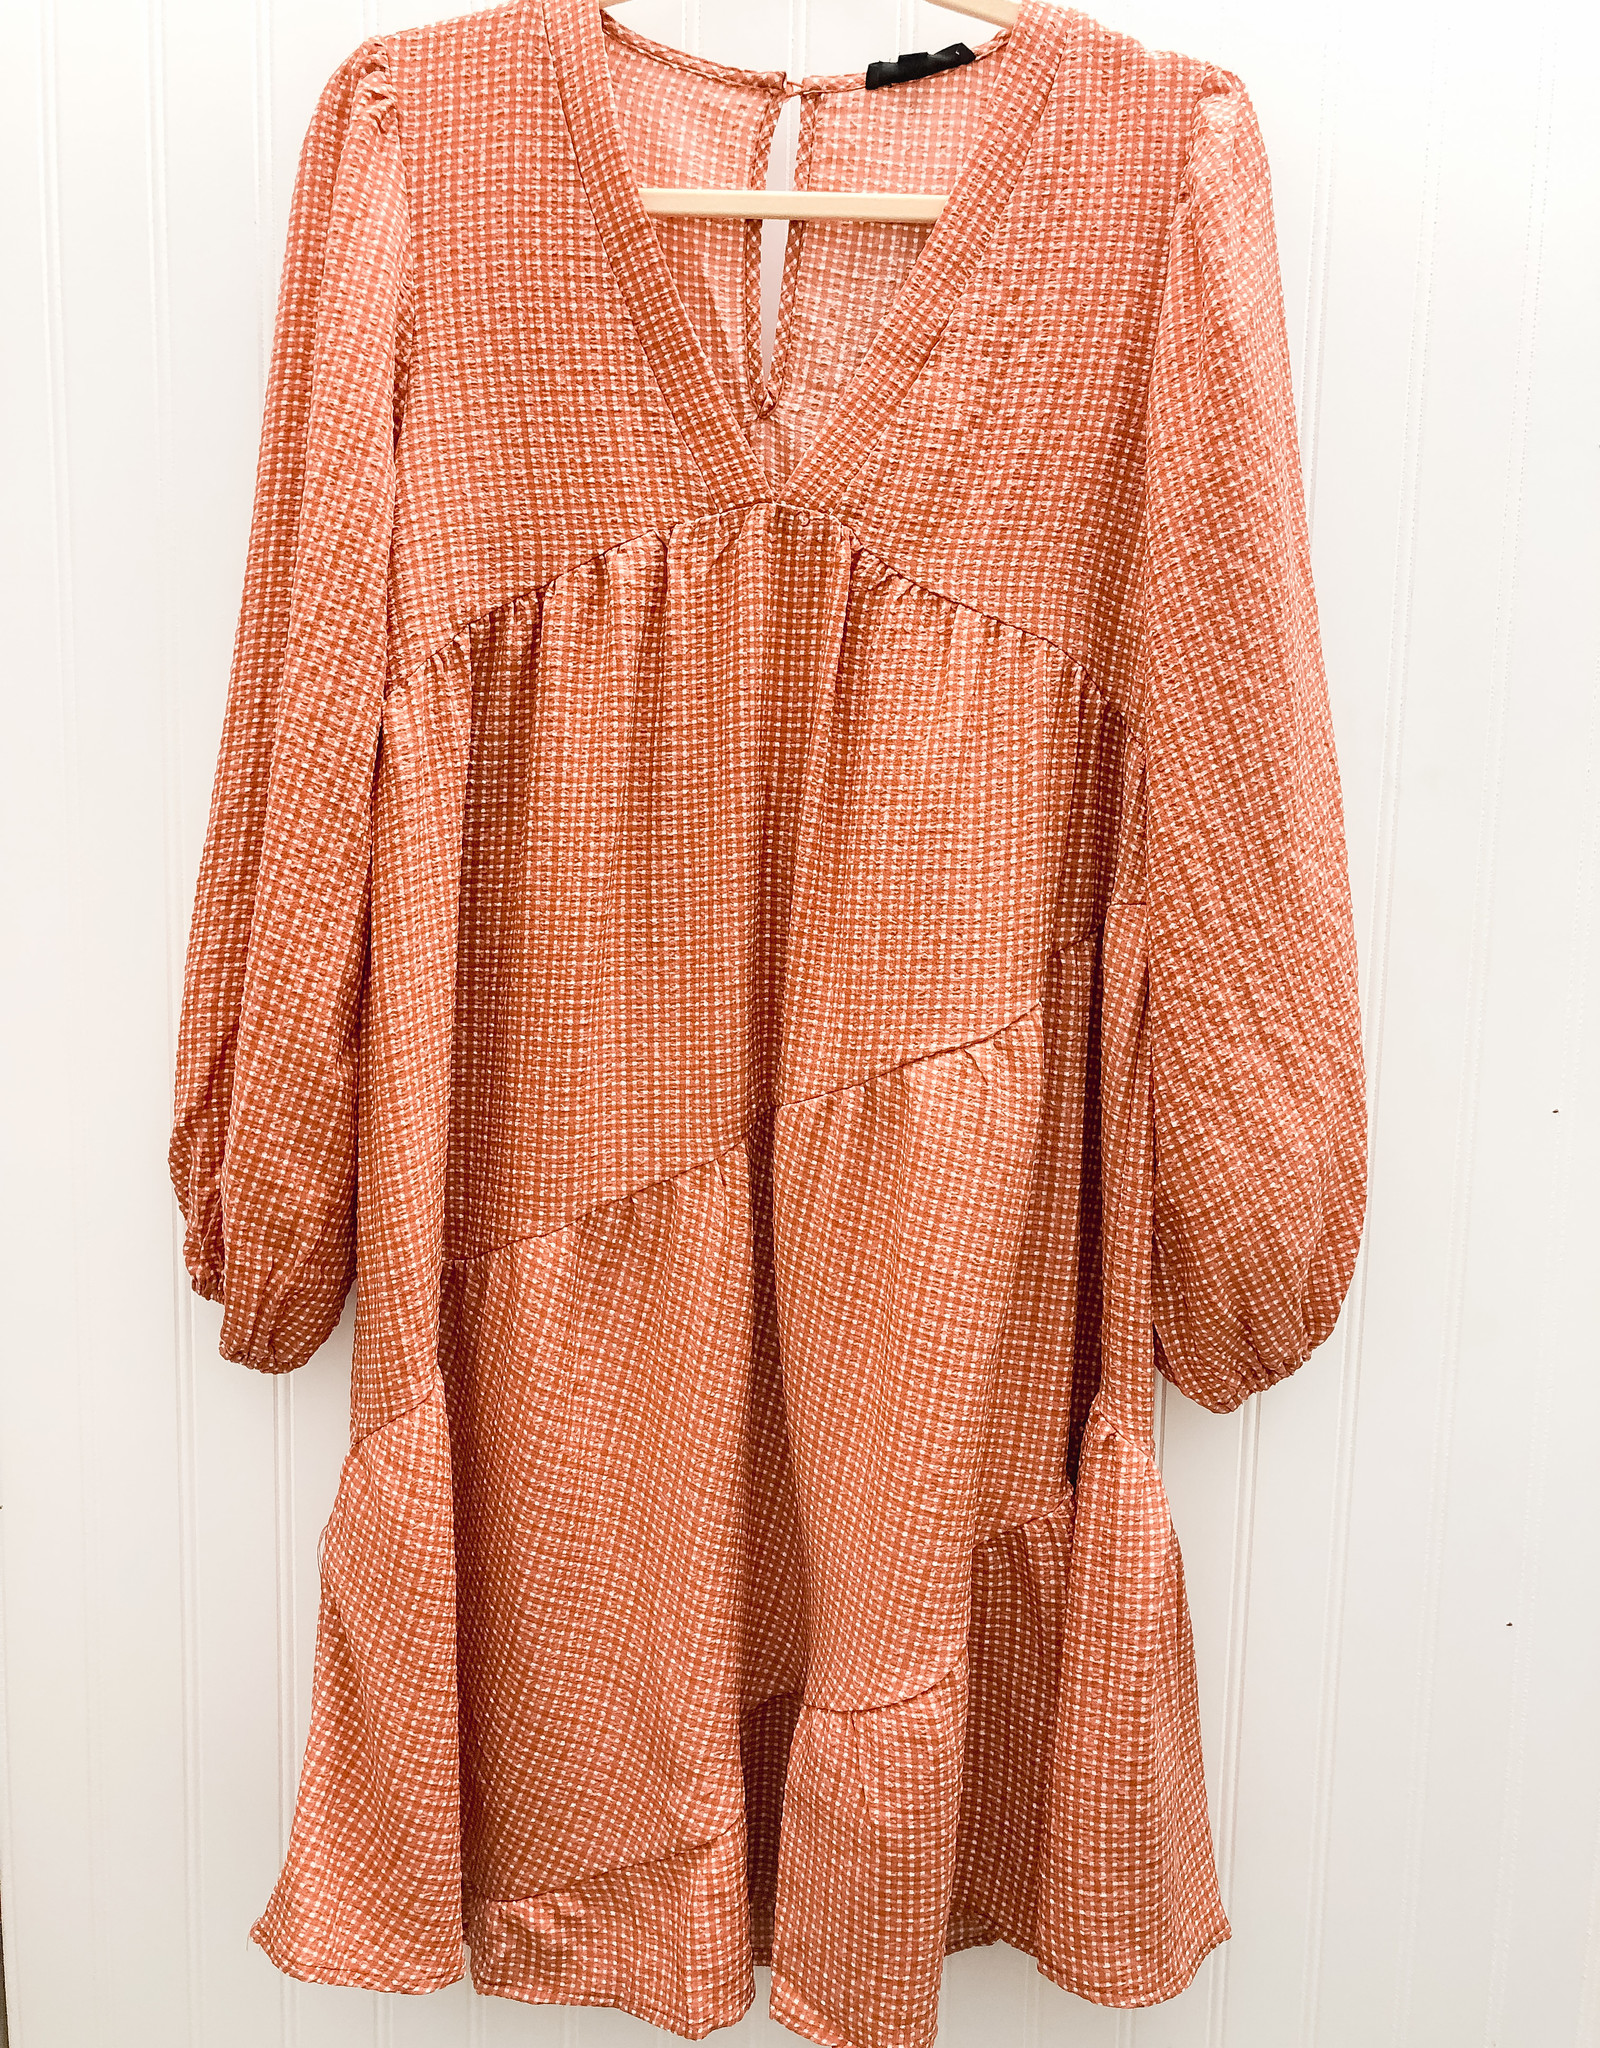 Mittoshop.com Gingham Tiered Baby Doll Dress